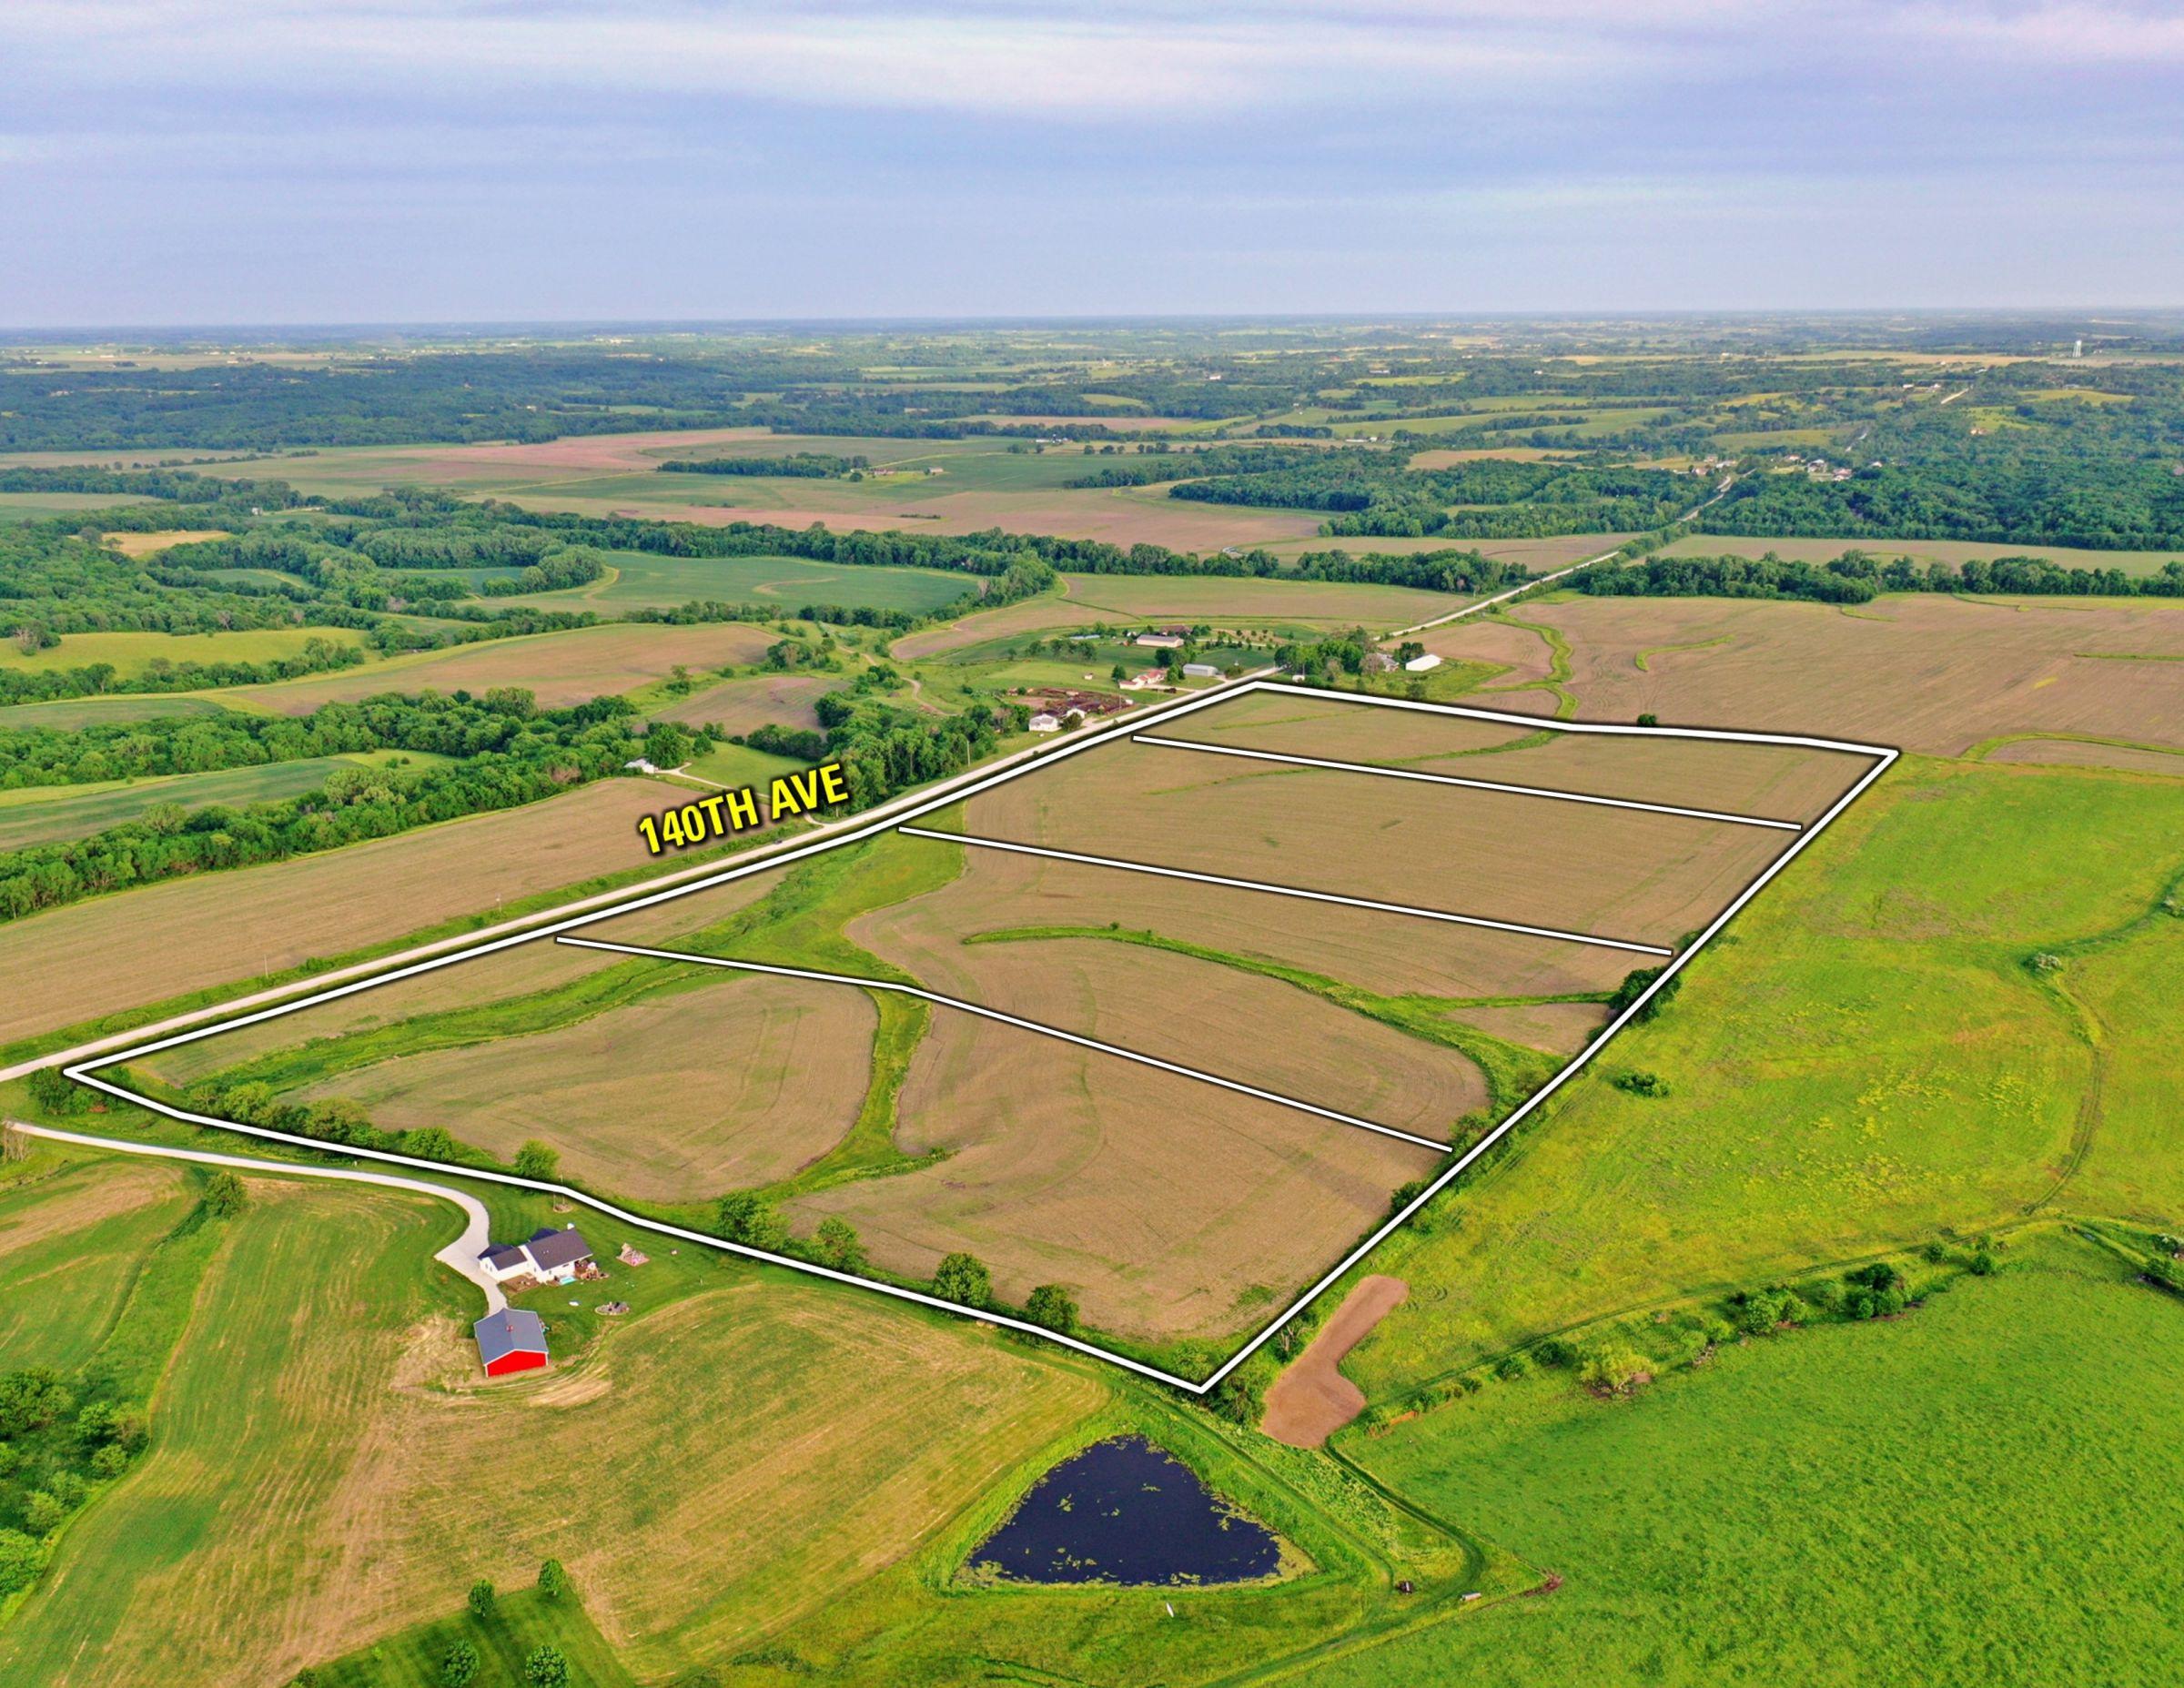 development-land-warren-county-iowa-20-acres-listing-number-15423-1-2021-03-26-184715.jpg